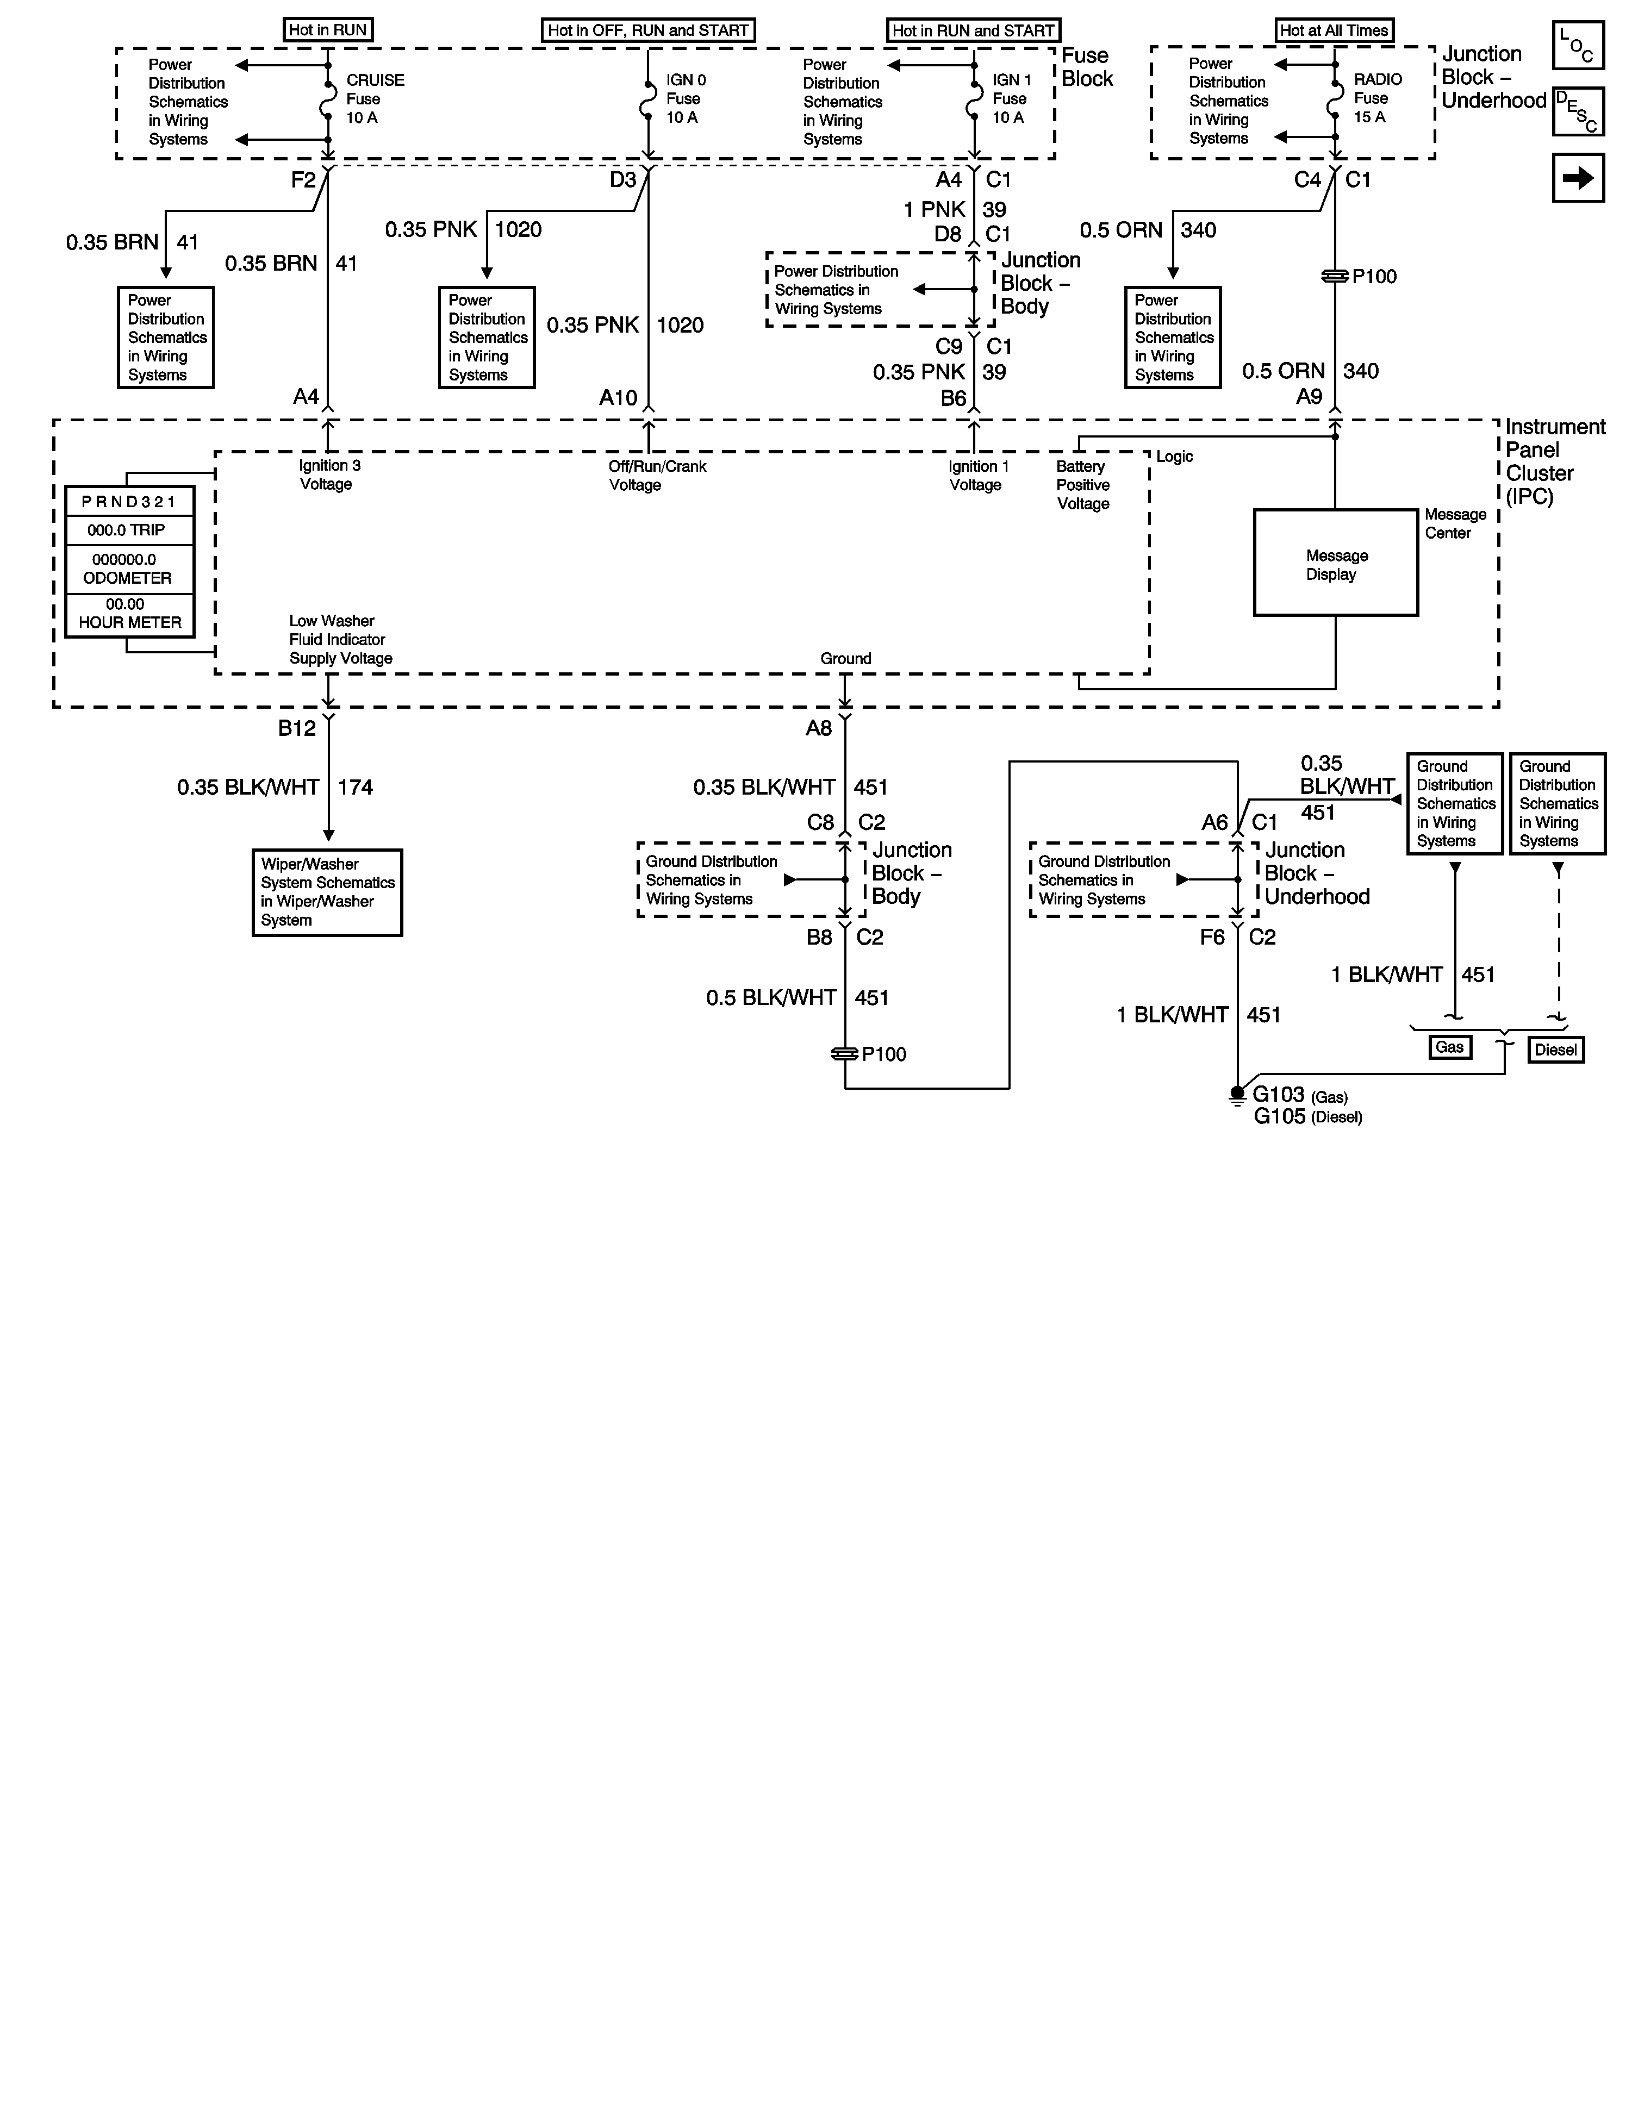 Diagram 1985 Suburban Fuse Diagram Full Version Hd Quality Fuse Diagram Diagramtree Media90 It